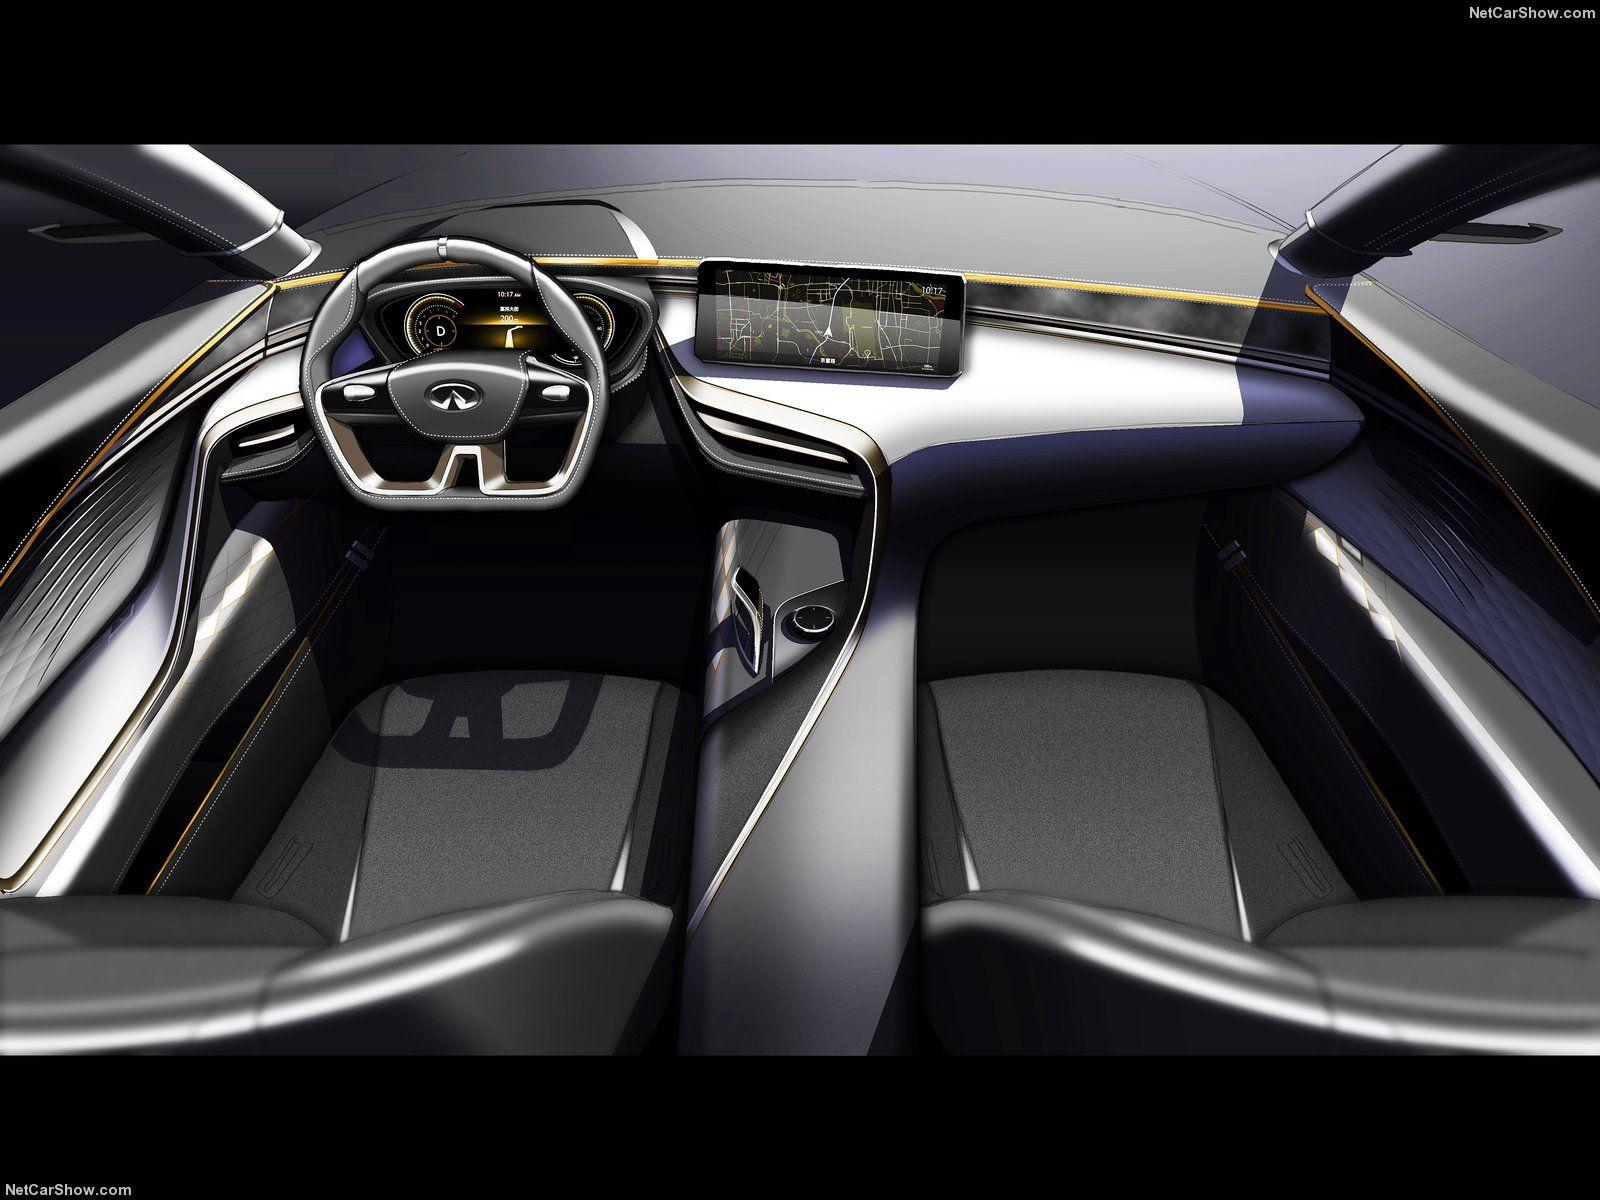 automotive interior design pinterest joshua de souza pinterest. Black Bedroom Furniture Sets. Home Design Ideas